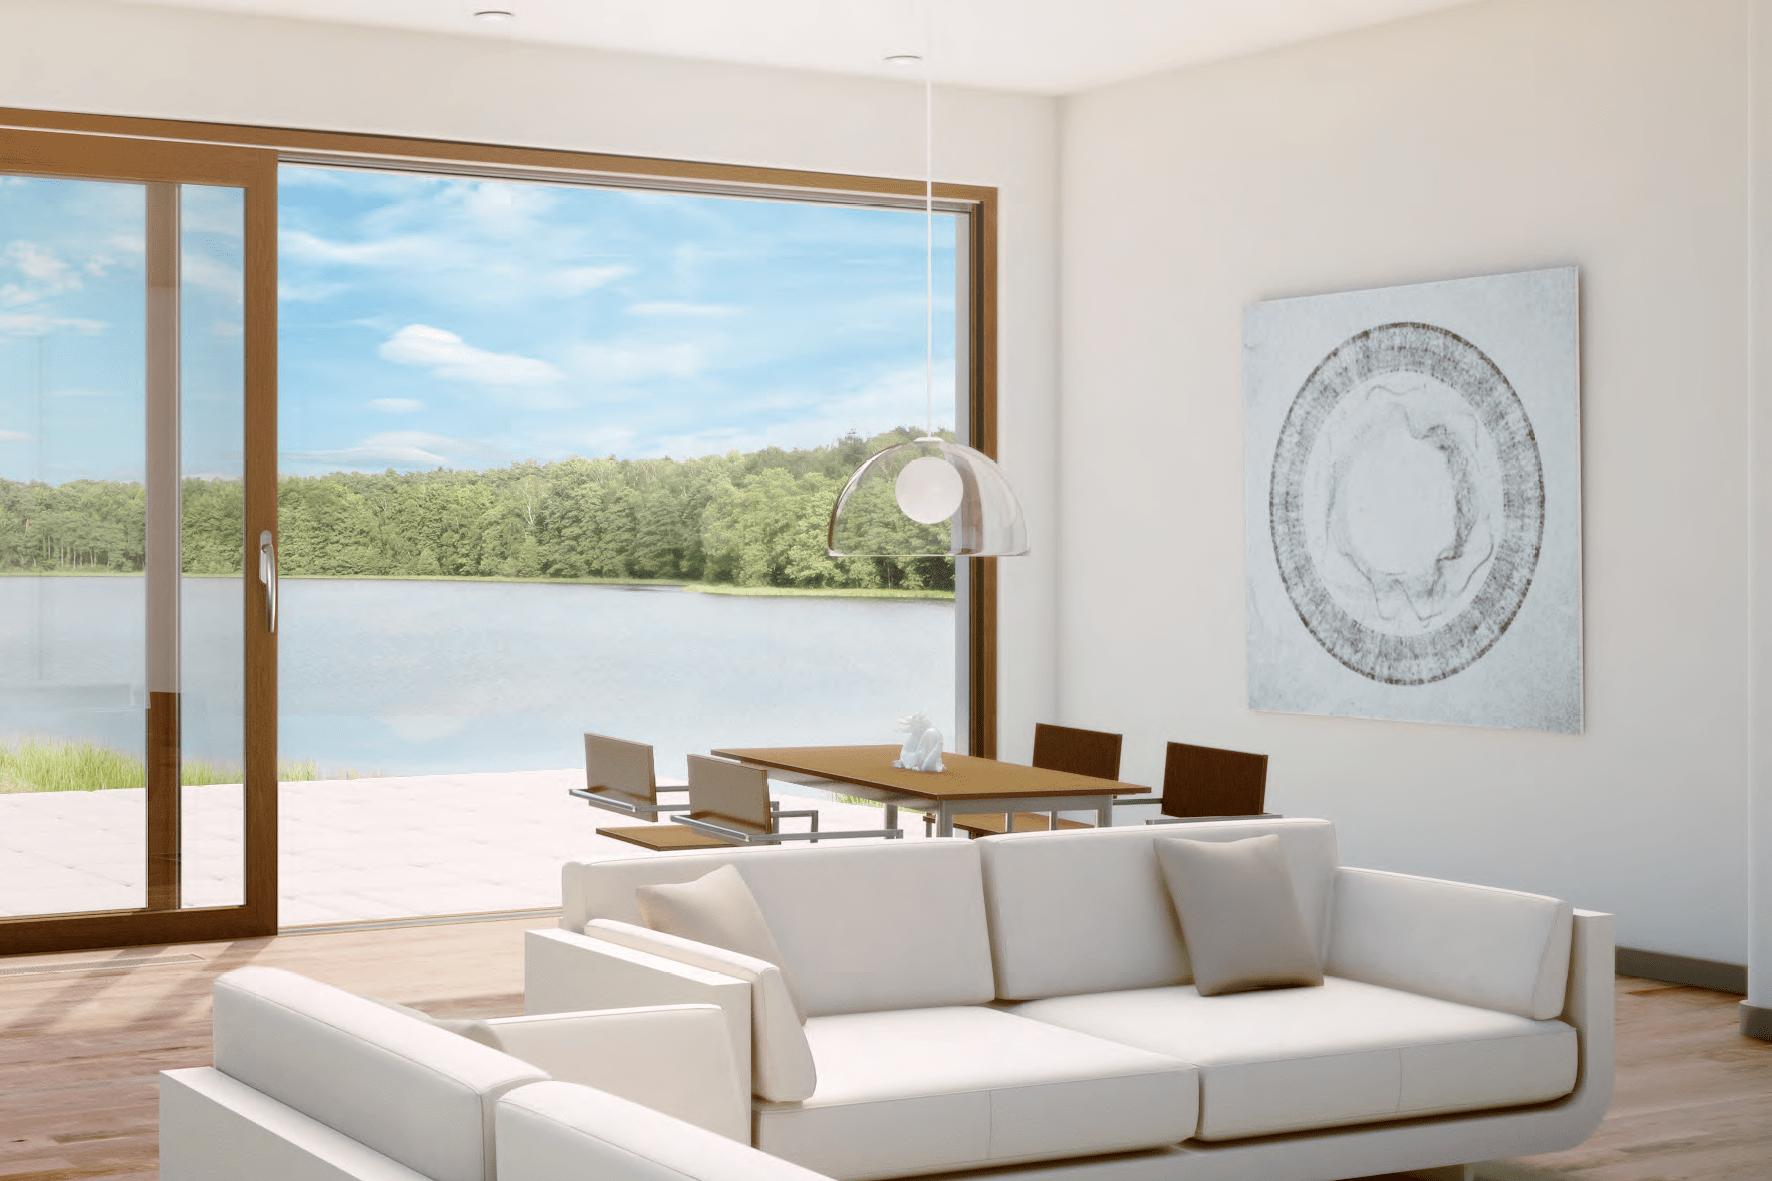 renovationen walker renova ag. Black Bedroom Furniture Sets. Home Design Ideas